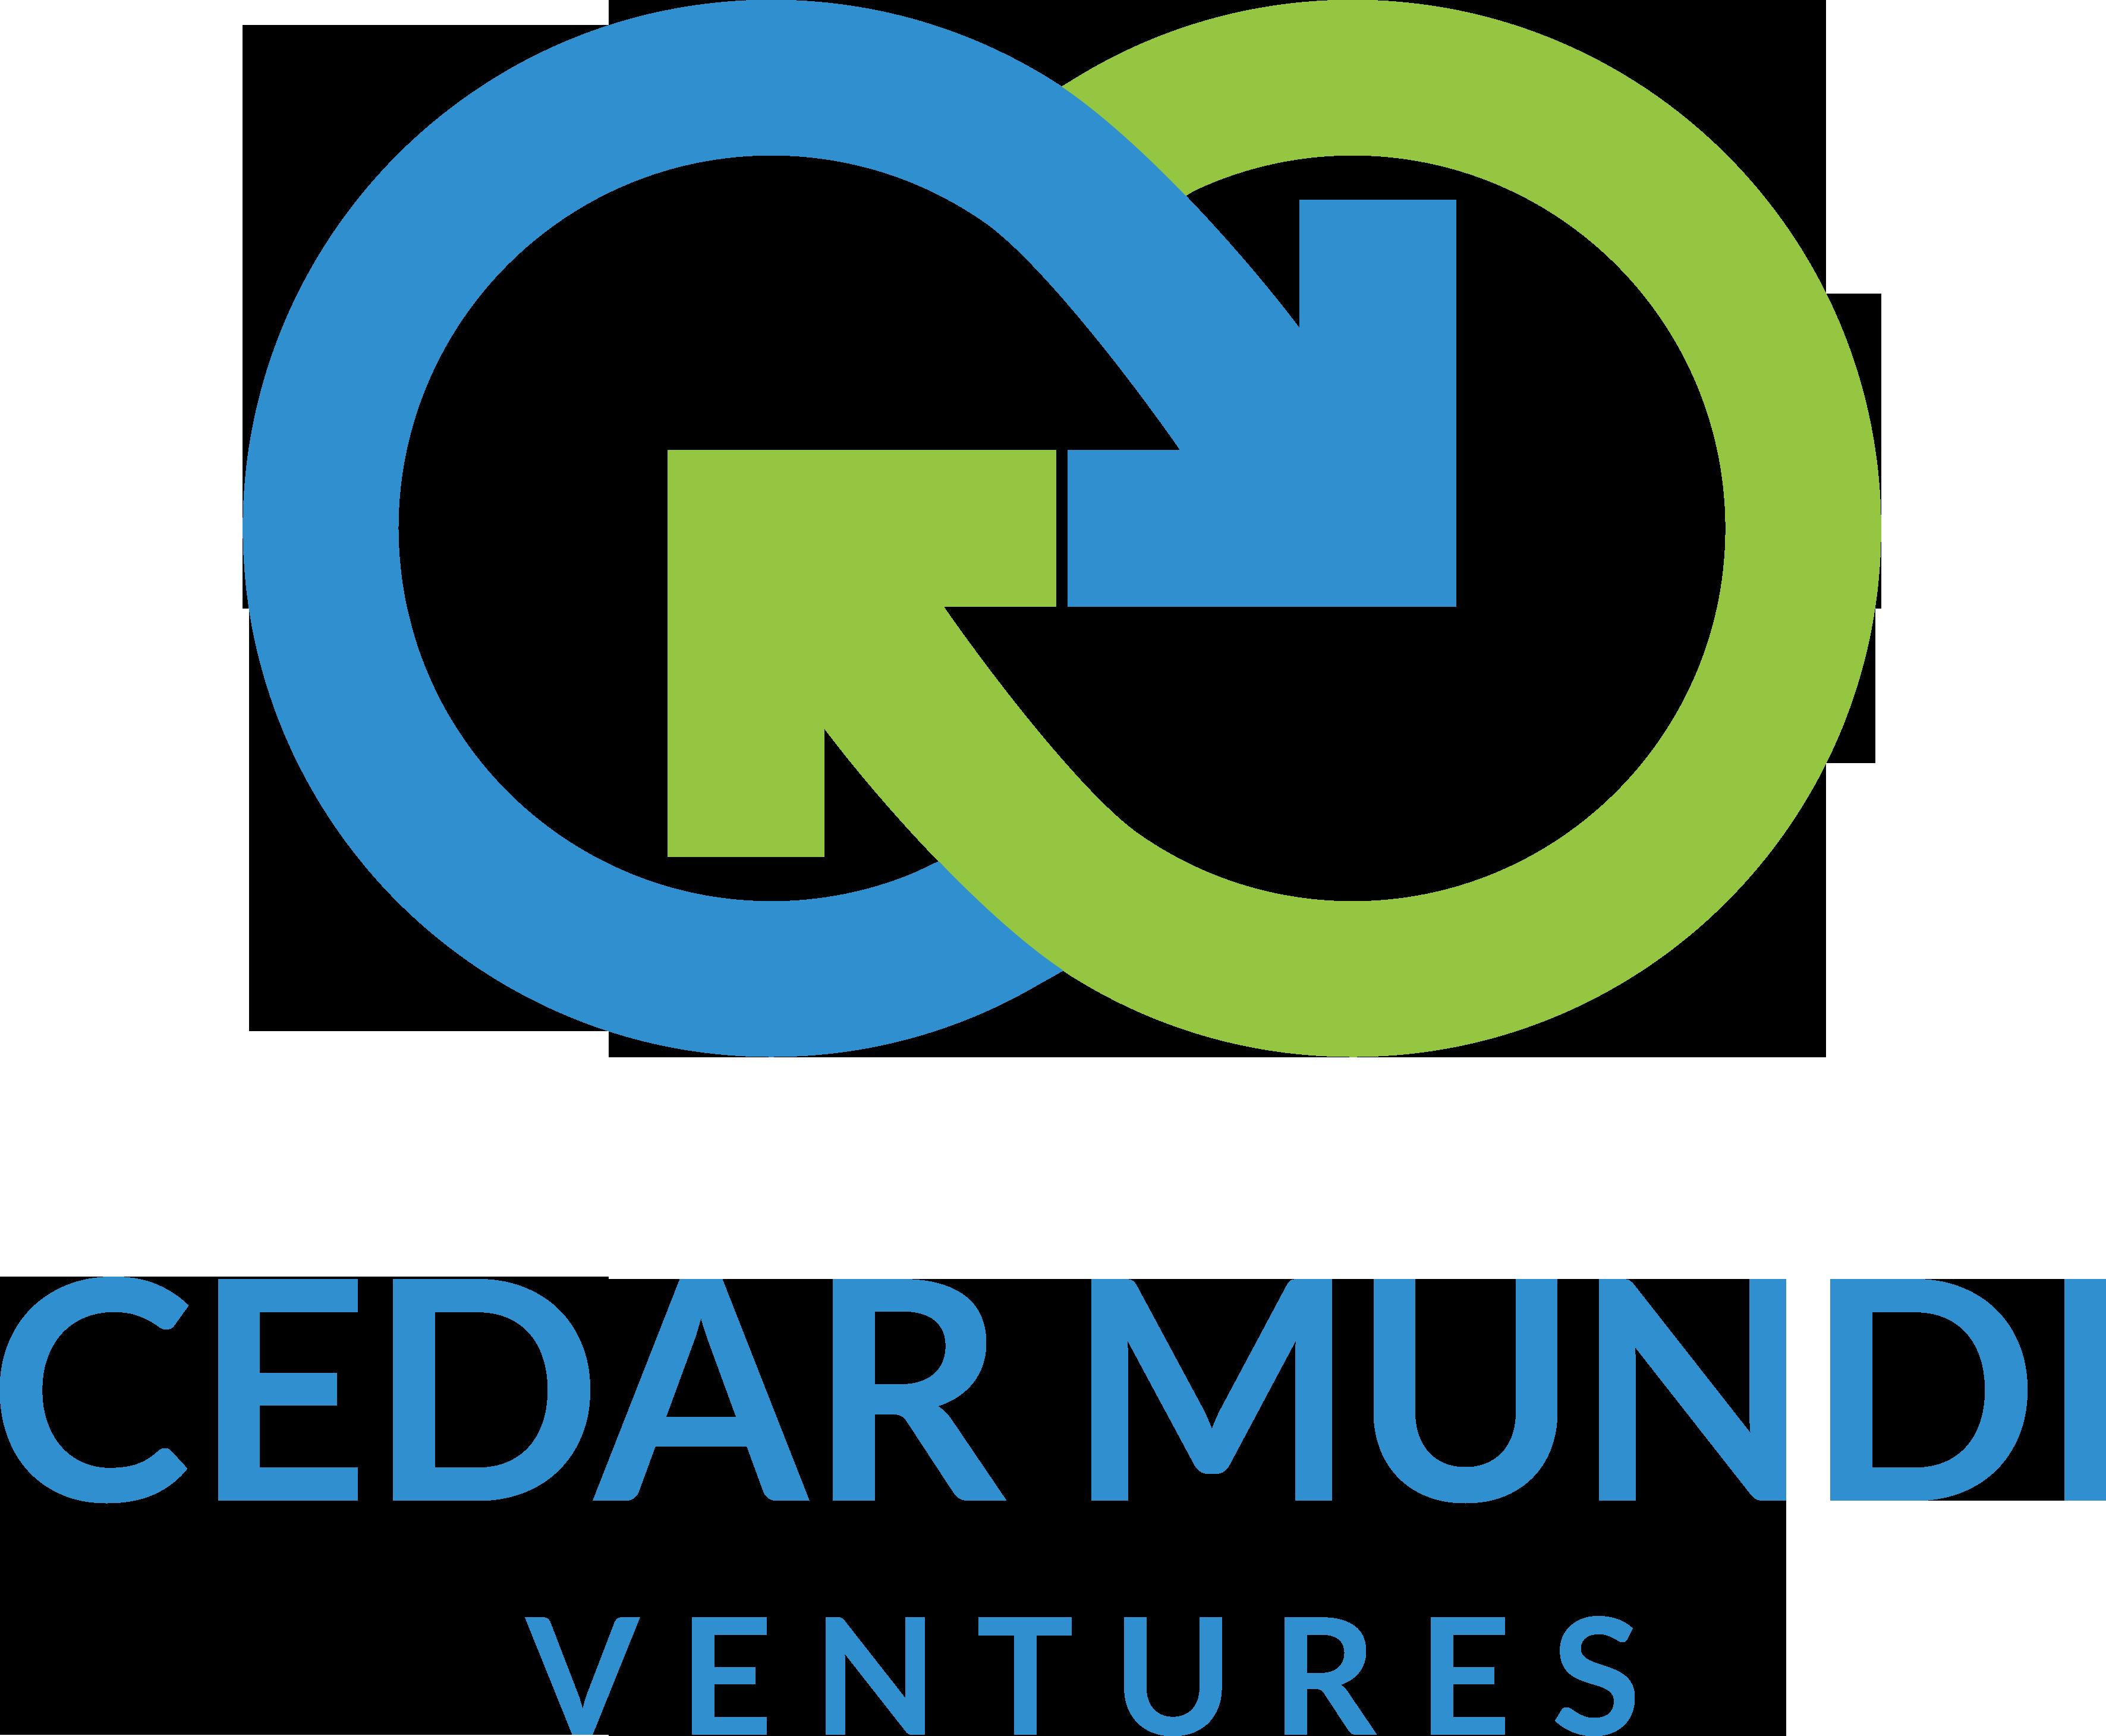 Cedar Mundi